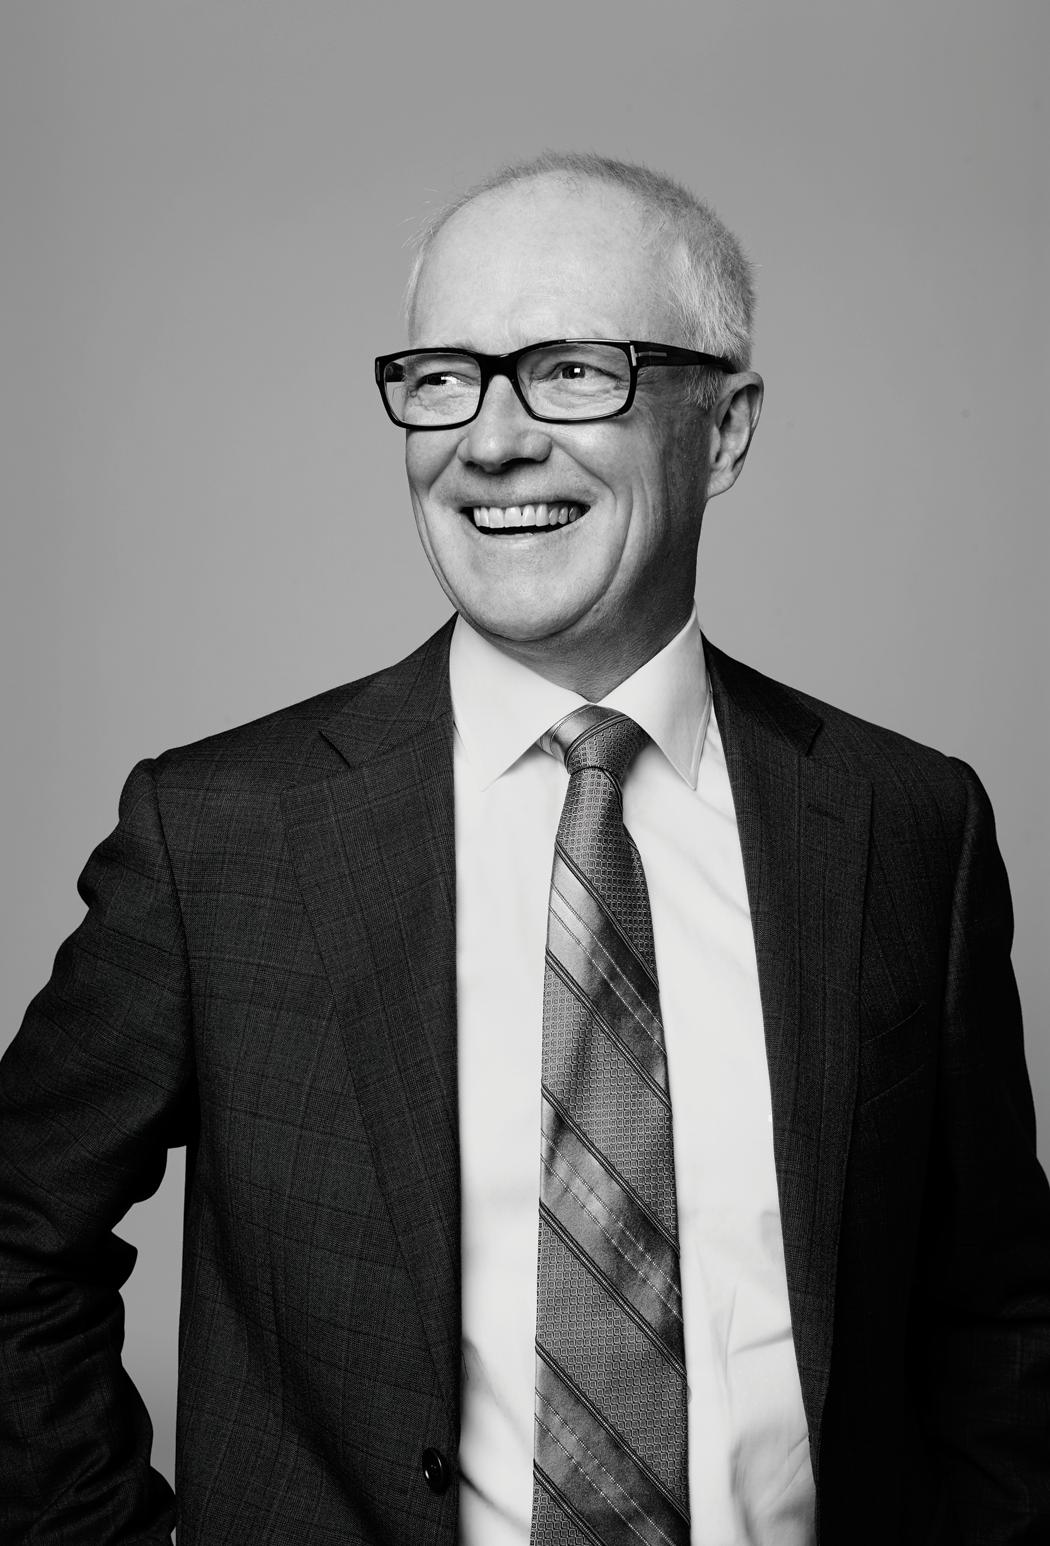 Alberta School of Business Dean, Joseph Doucet